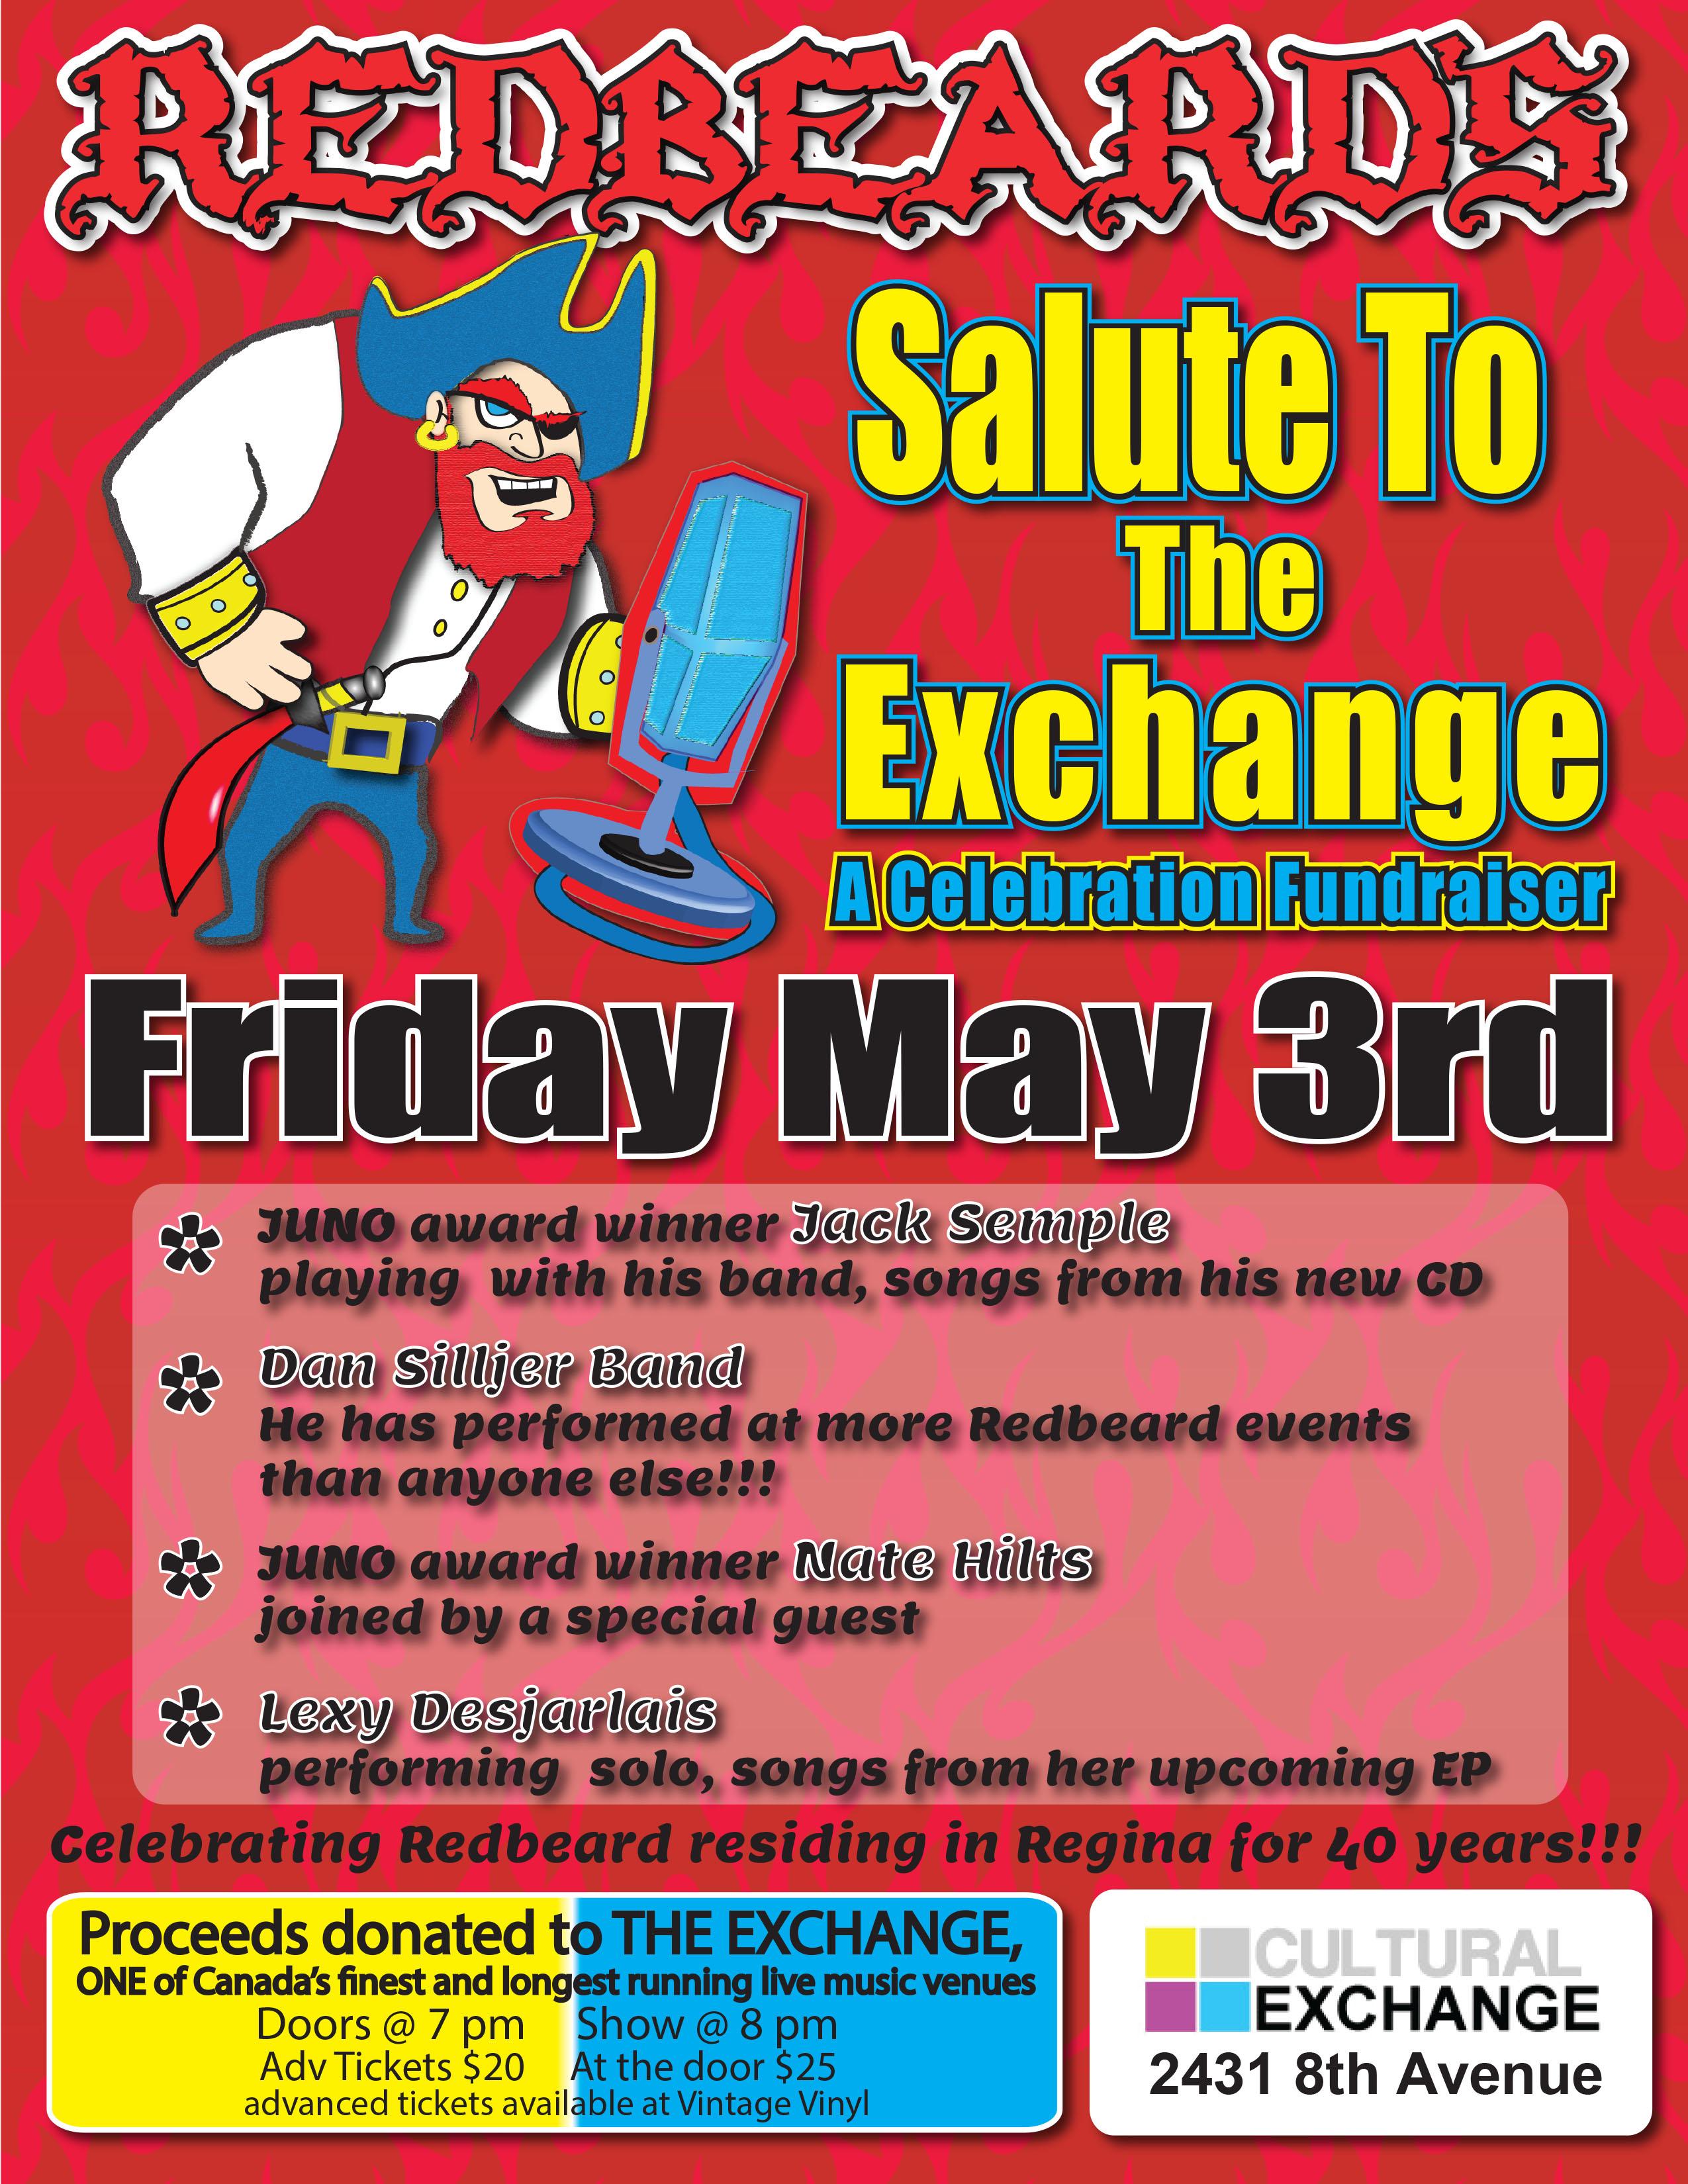 Jack Semple, Dan Silljer Band, Nate Hilts & Lexy Desjarlais - Redbeards Salute to the Exchange